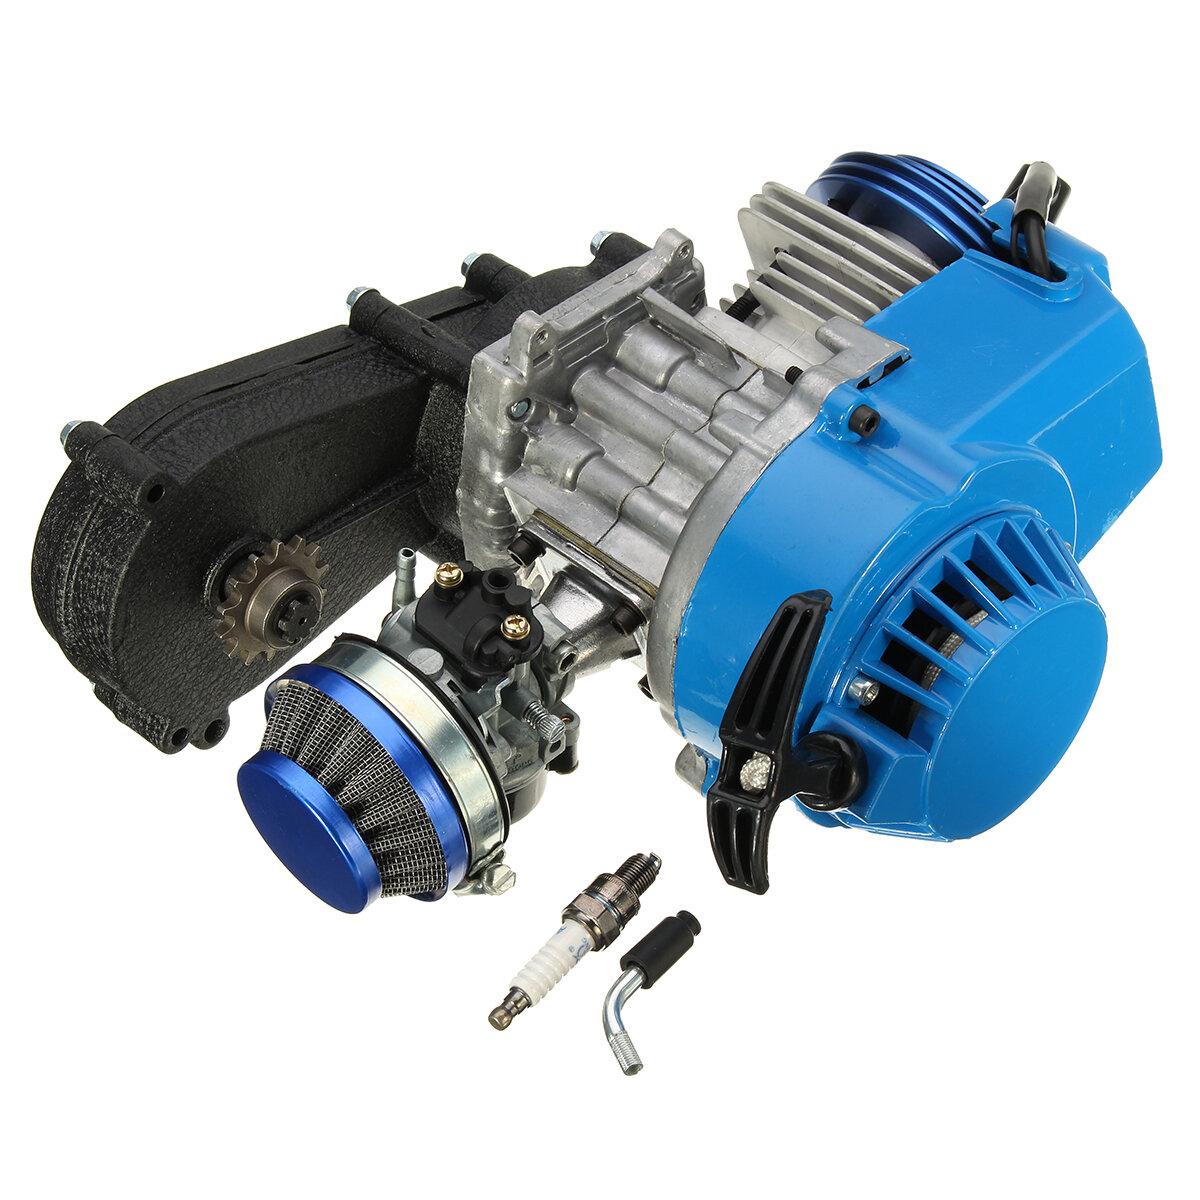 hight resolution of 49cc 2 stroke engine motor w carb air filter gear box mini dirt bike quad atv cod